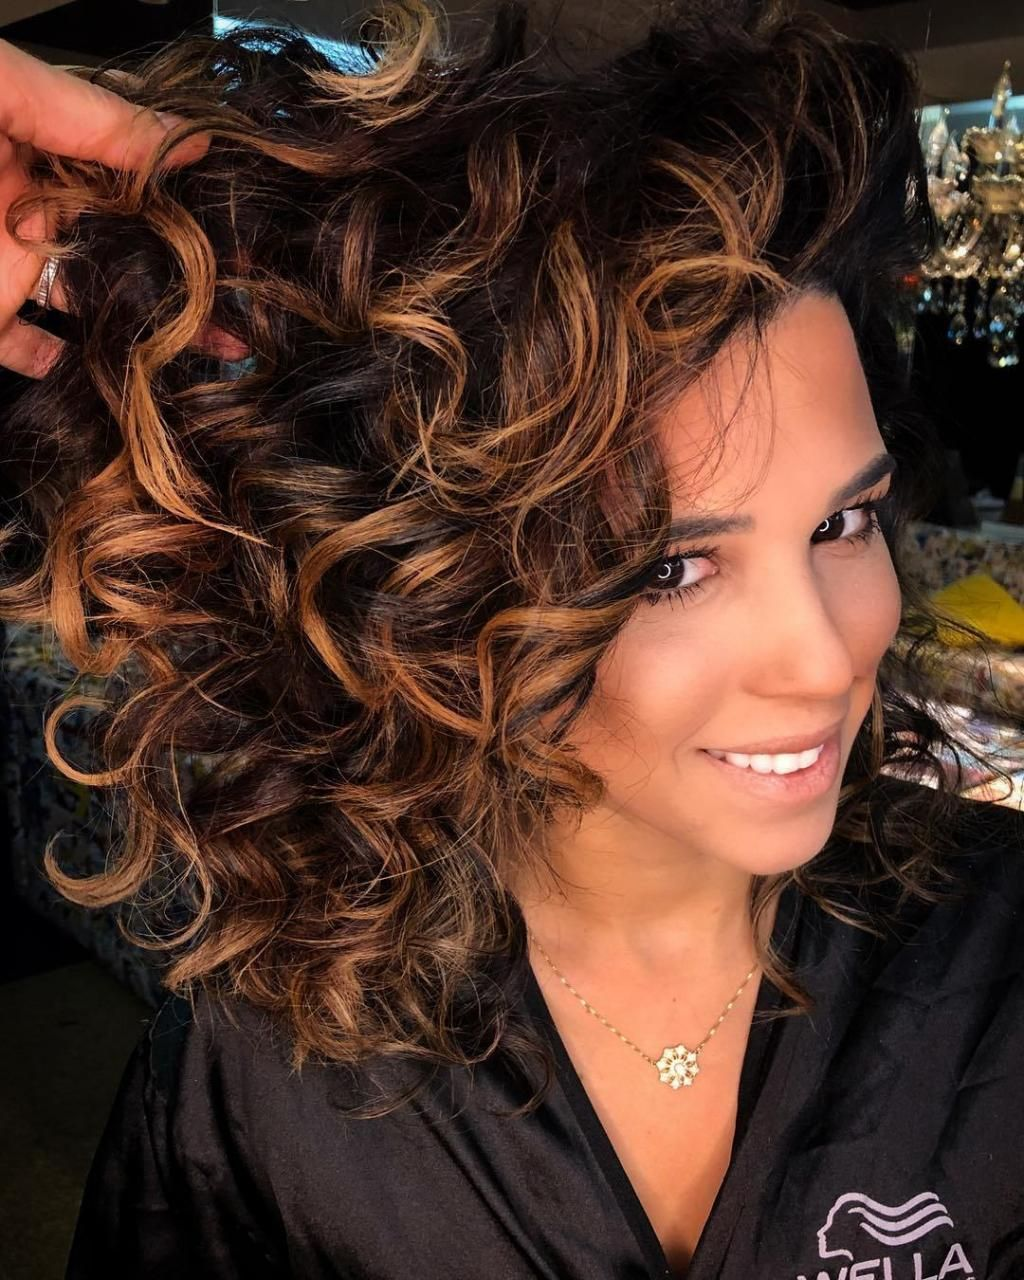 Pin By Rita Catita On Projetos Para Experimentar In 2020 Hair Color Caramel Brown Hair With Highlights Highlights Curly Hair